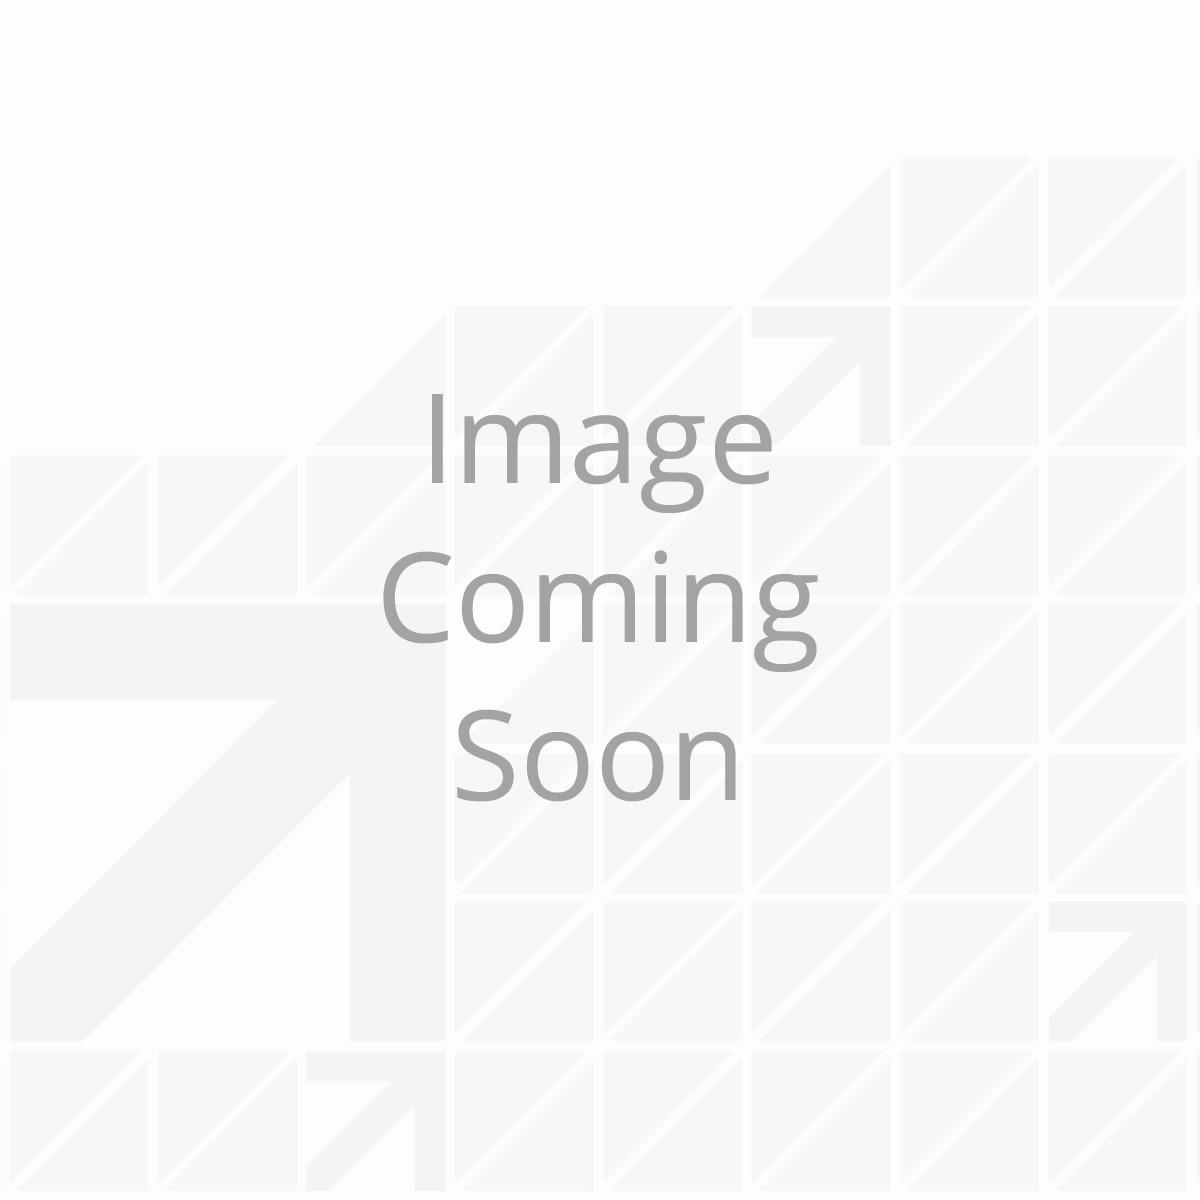 1010 Low VOC Non-Sag Sealant, Beige (10.3 Oz. Tube)